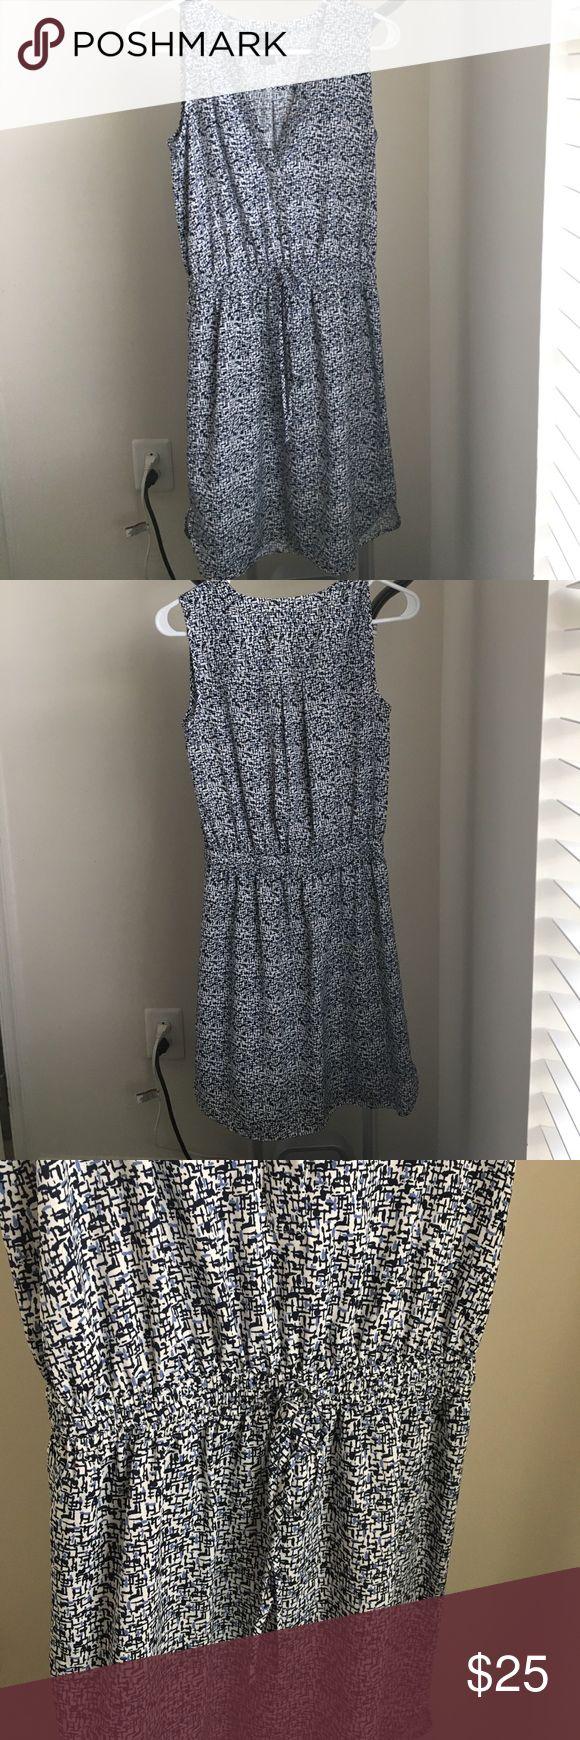 Ann Taylor Drawstring Waist Dress Blue and white patterned v-neck dress. Drawstring waist. 100% polyester, 5% spandex. Ann Taylor Dresses